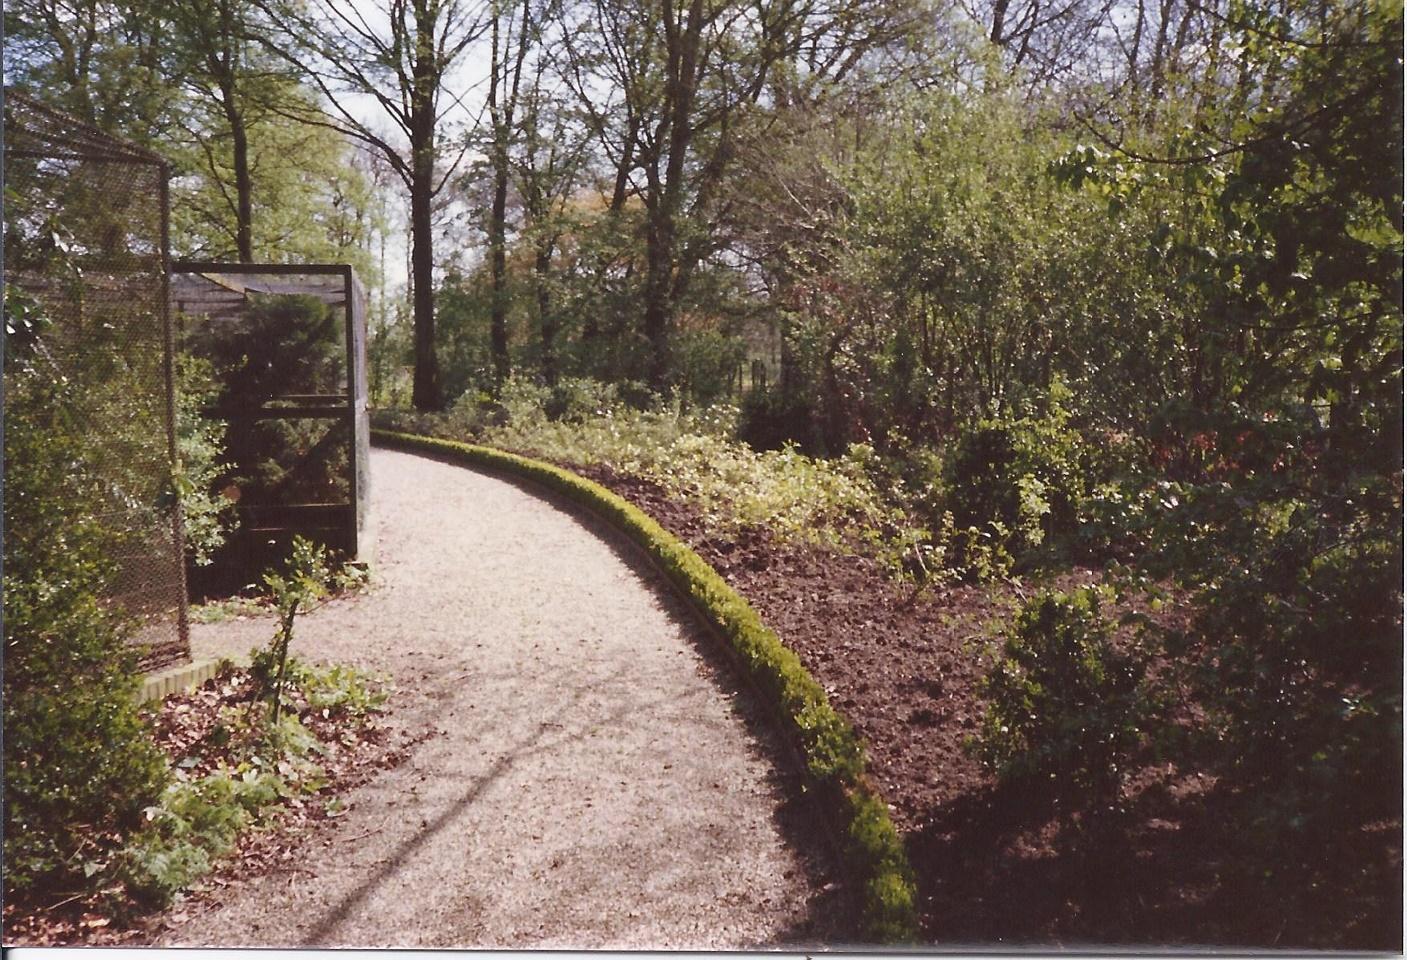 Stichting Nyenrode Fonds - Menagerie - Fazanterie, historische foto 1988 (1)